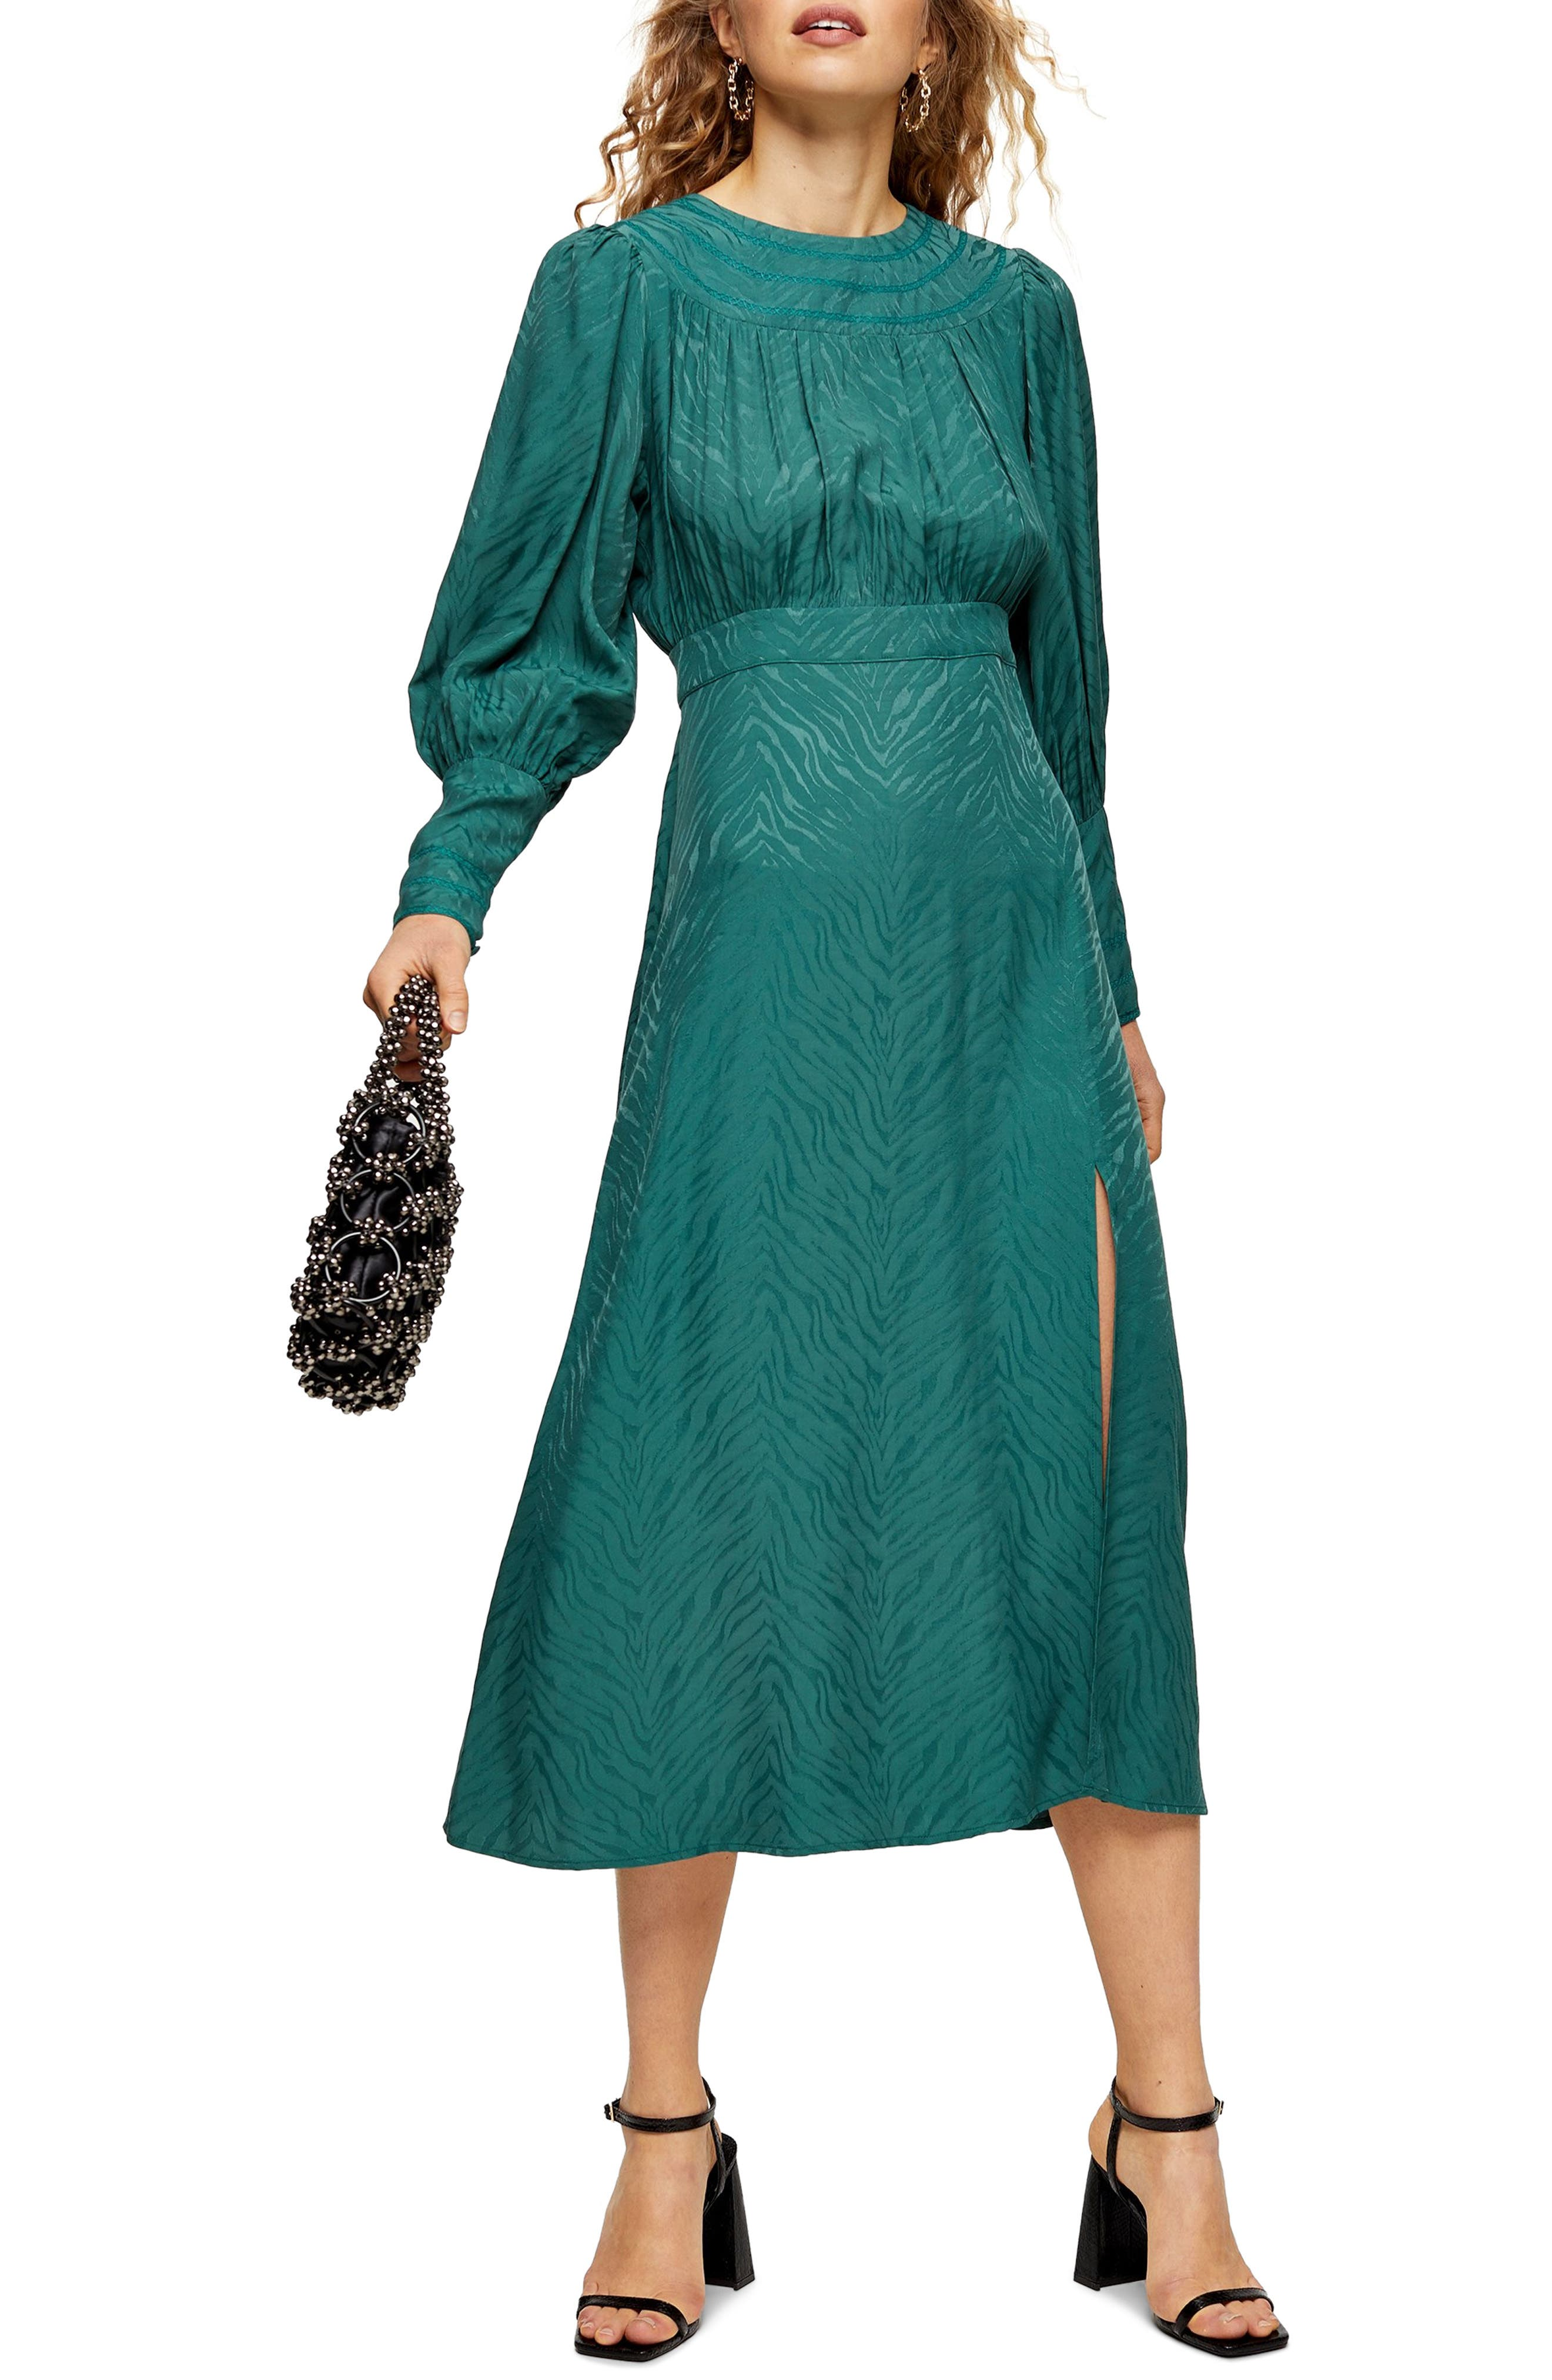 1920s Evening Dresses & Formal Gowns Womens Topshop Fallen Long Sleeve Jacquard Midi Dress $95.00 AT vintagedancer.com